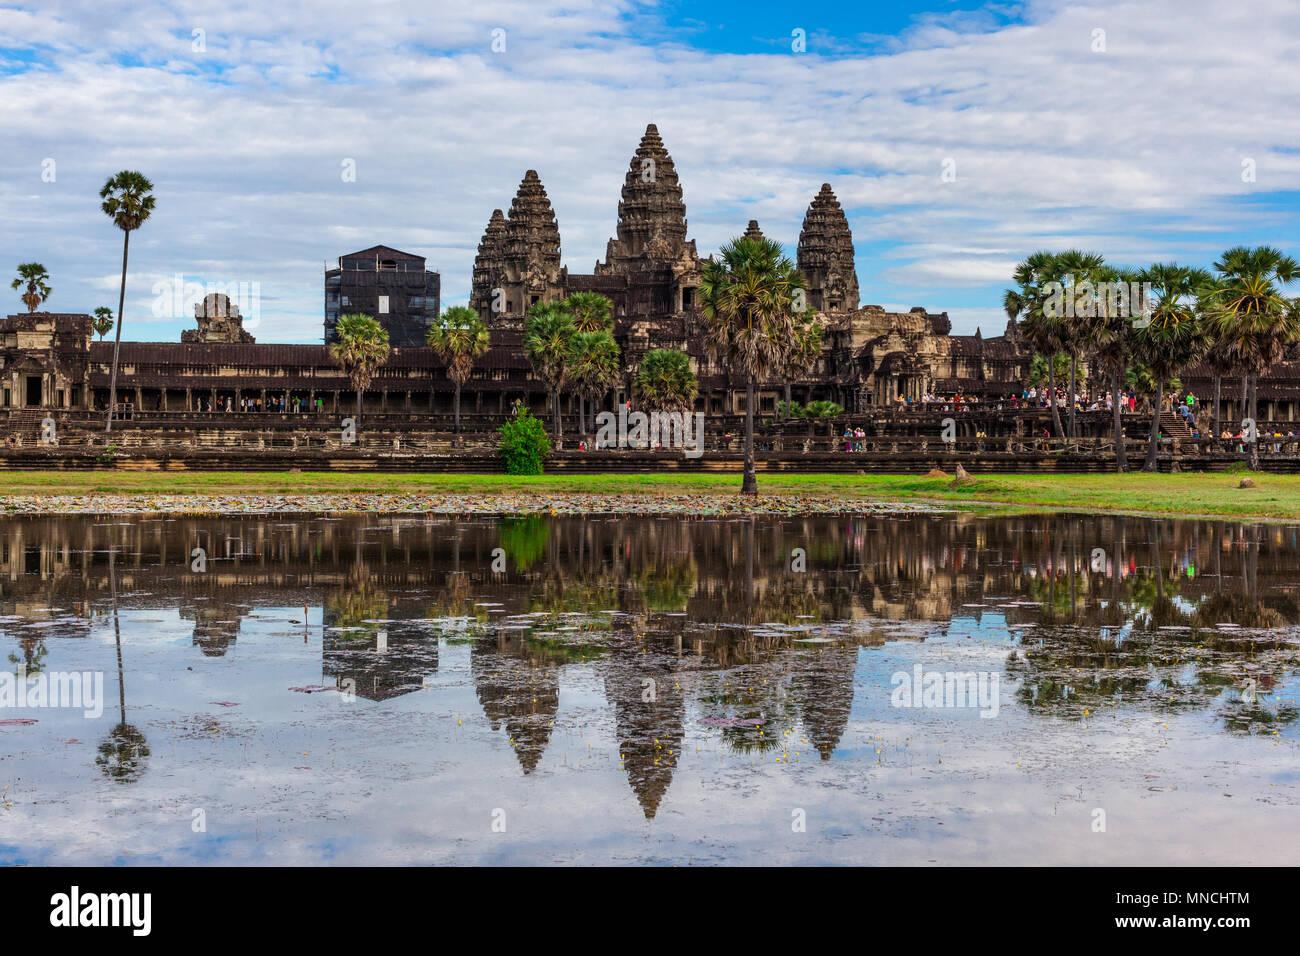 Temple of Angkor Wat, Cambodia - Stock Image